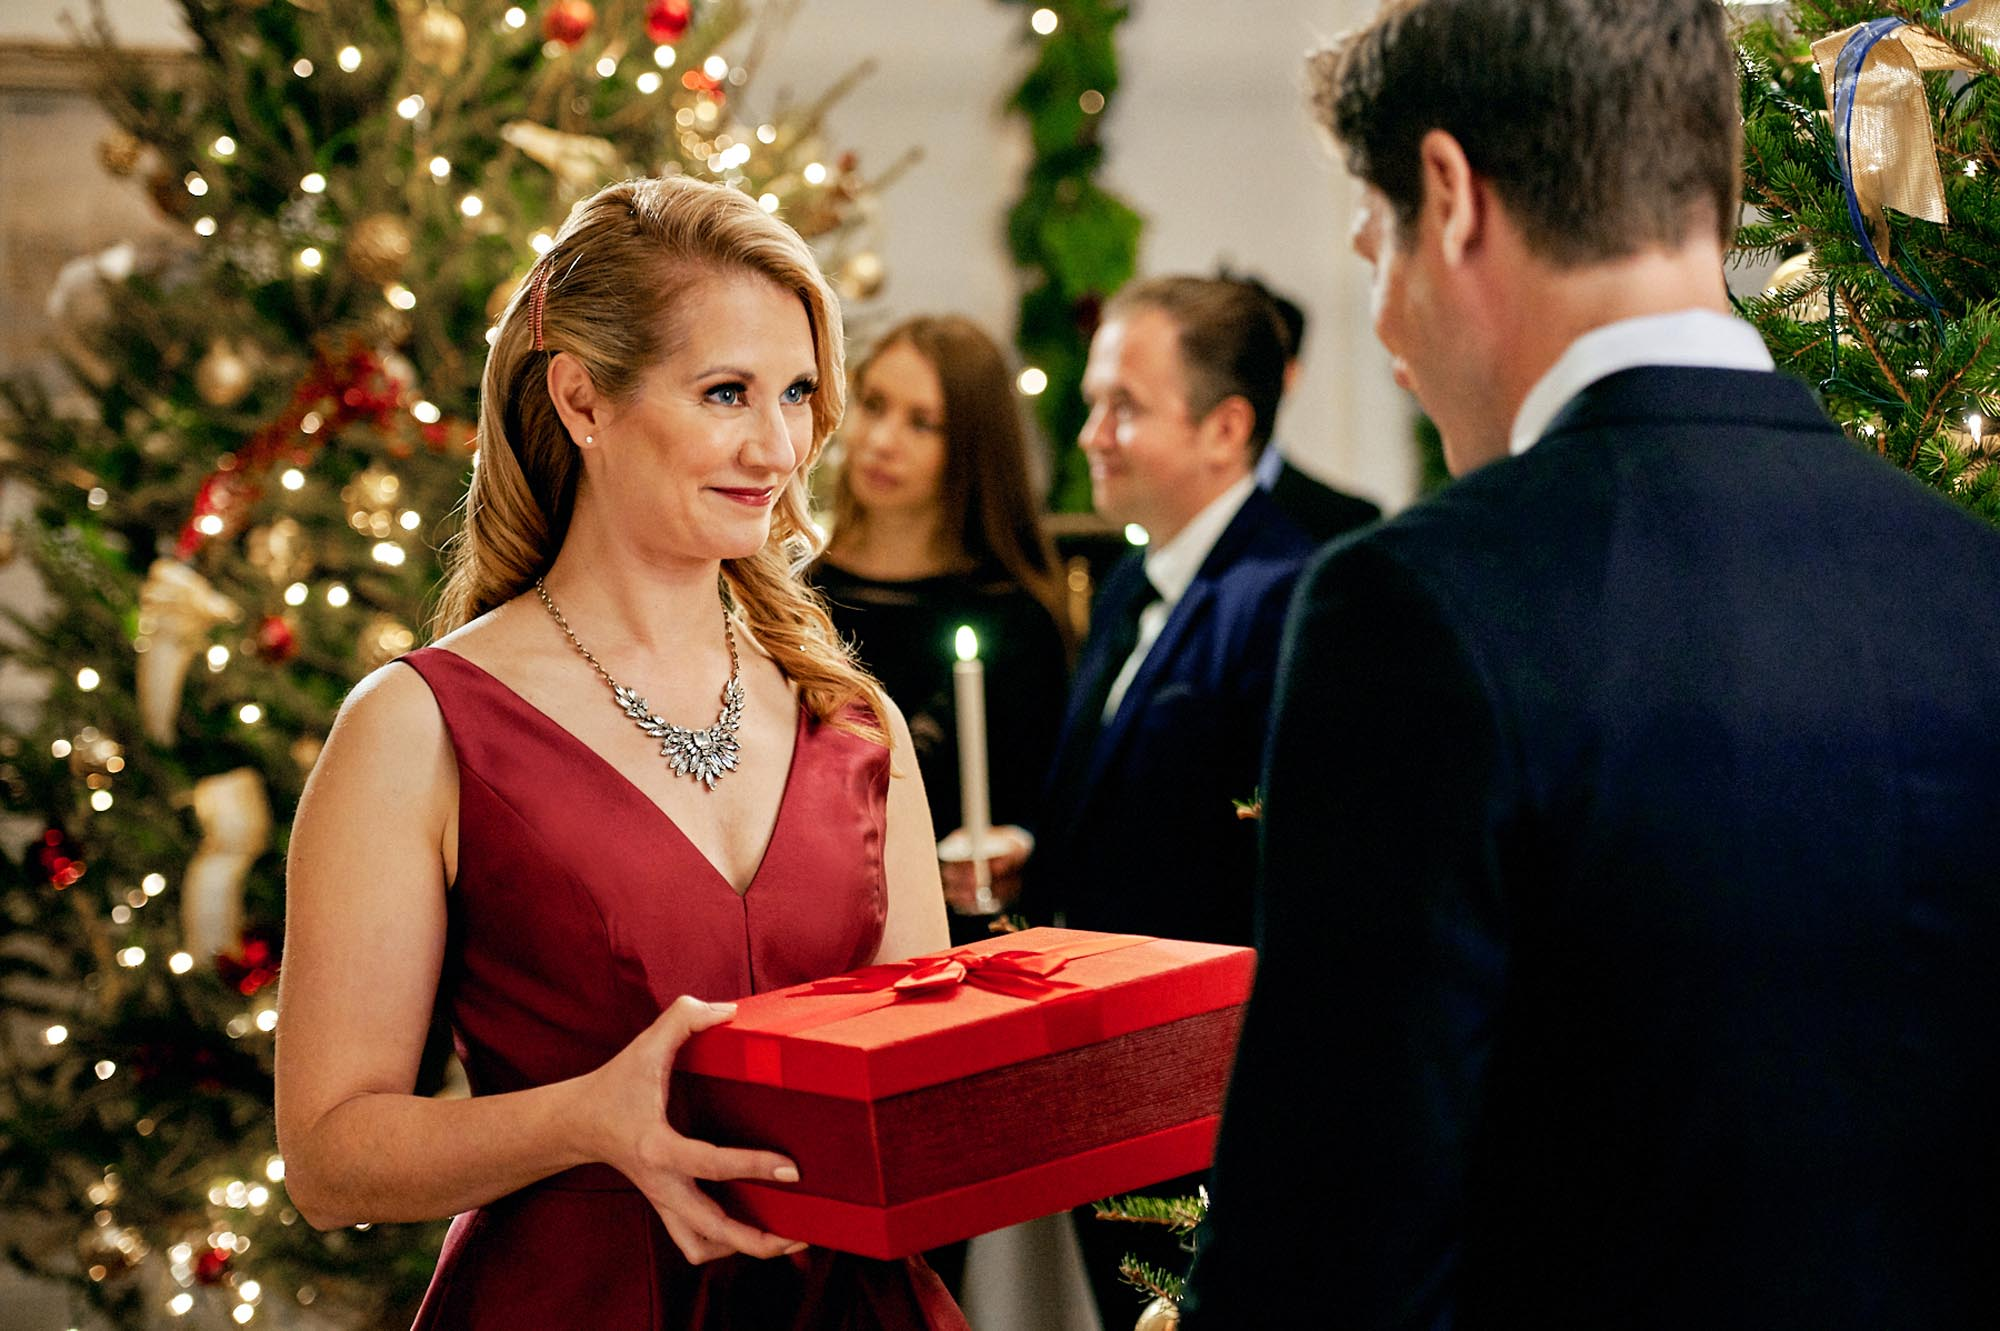 2021 Lifetime Christmas Movies - Match Made in Mistletoe